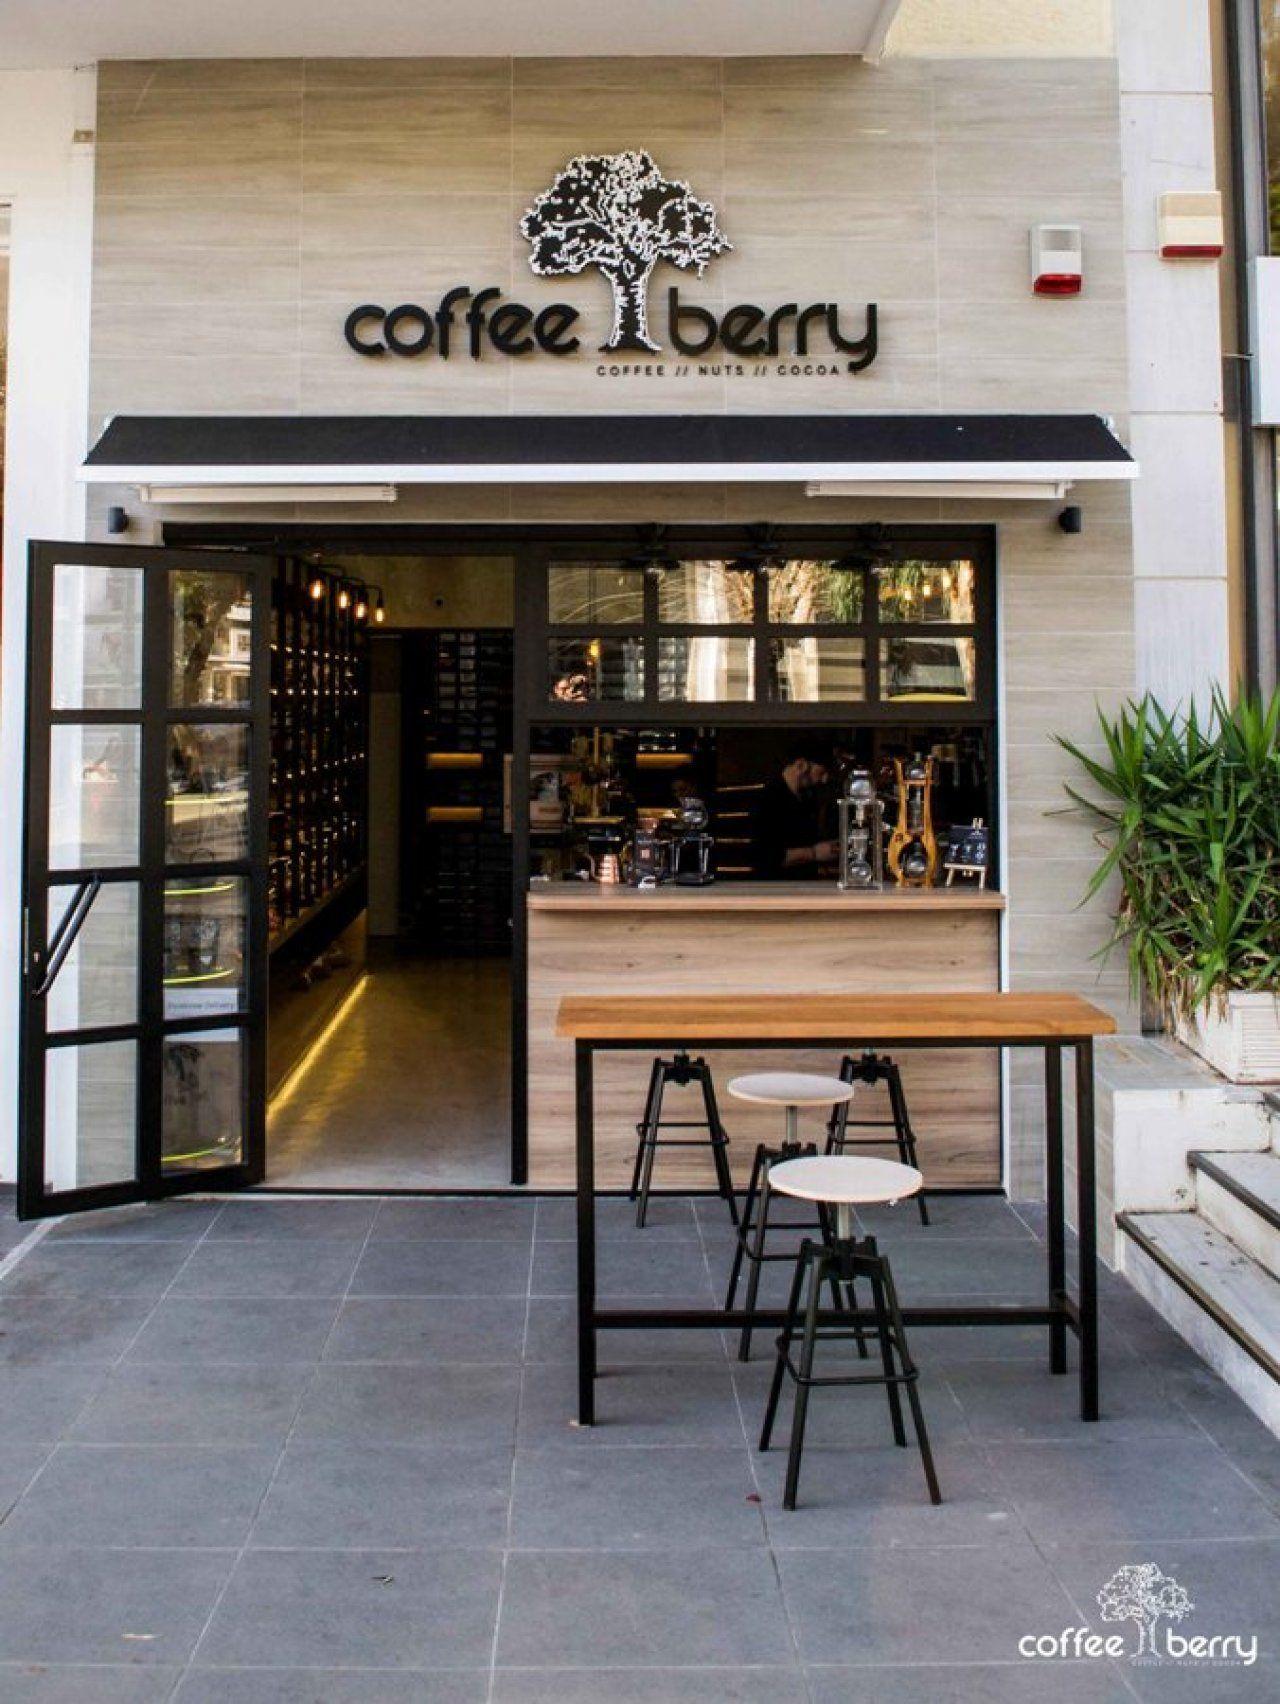 Coffee shop concept